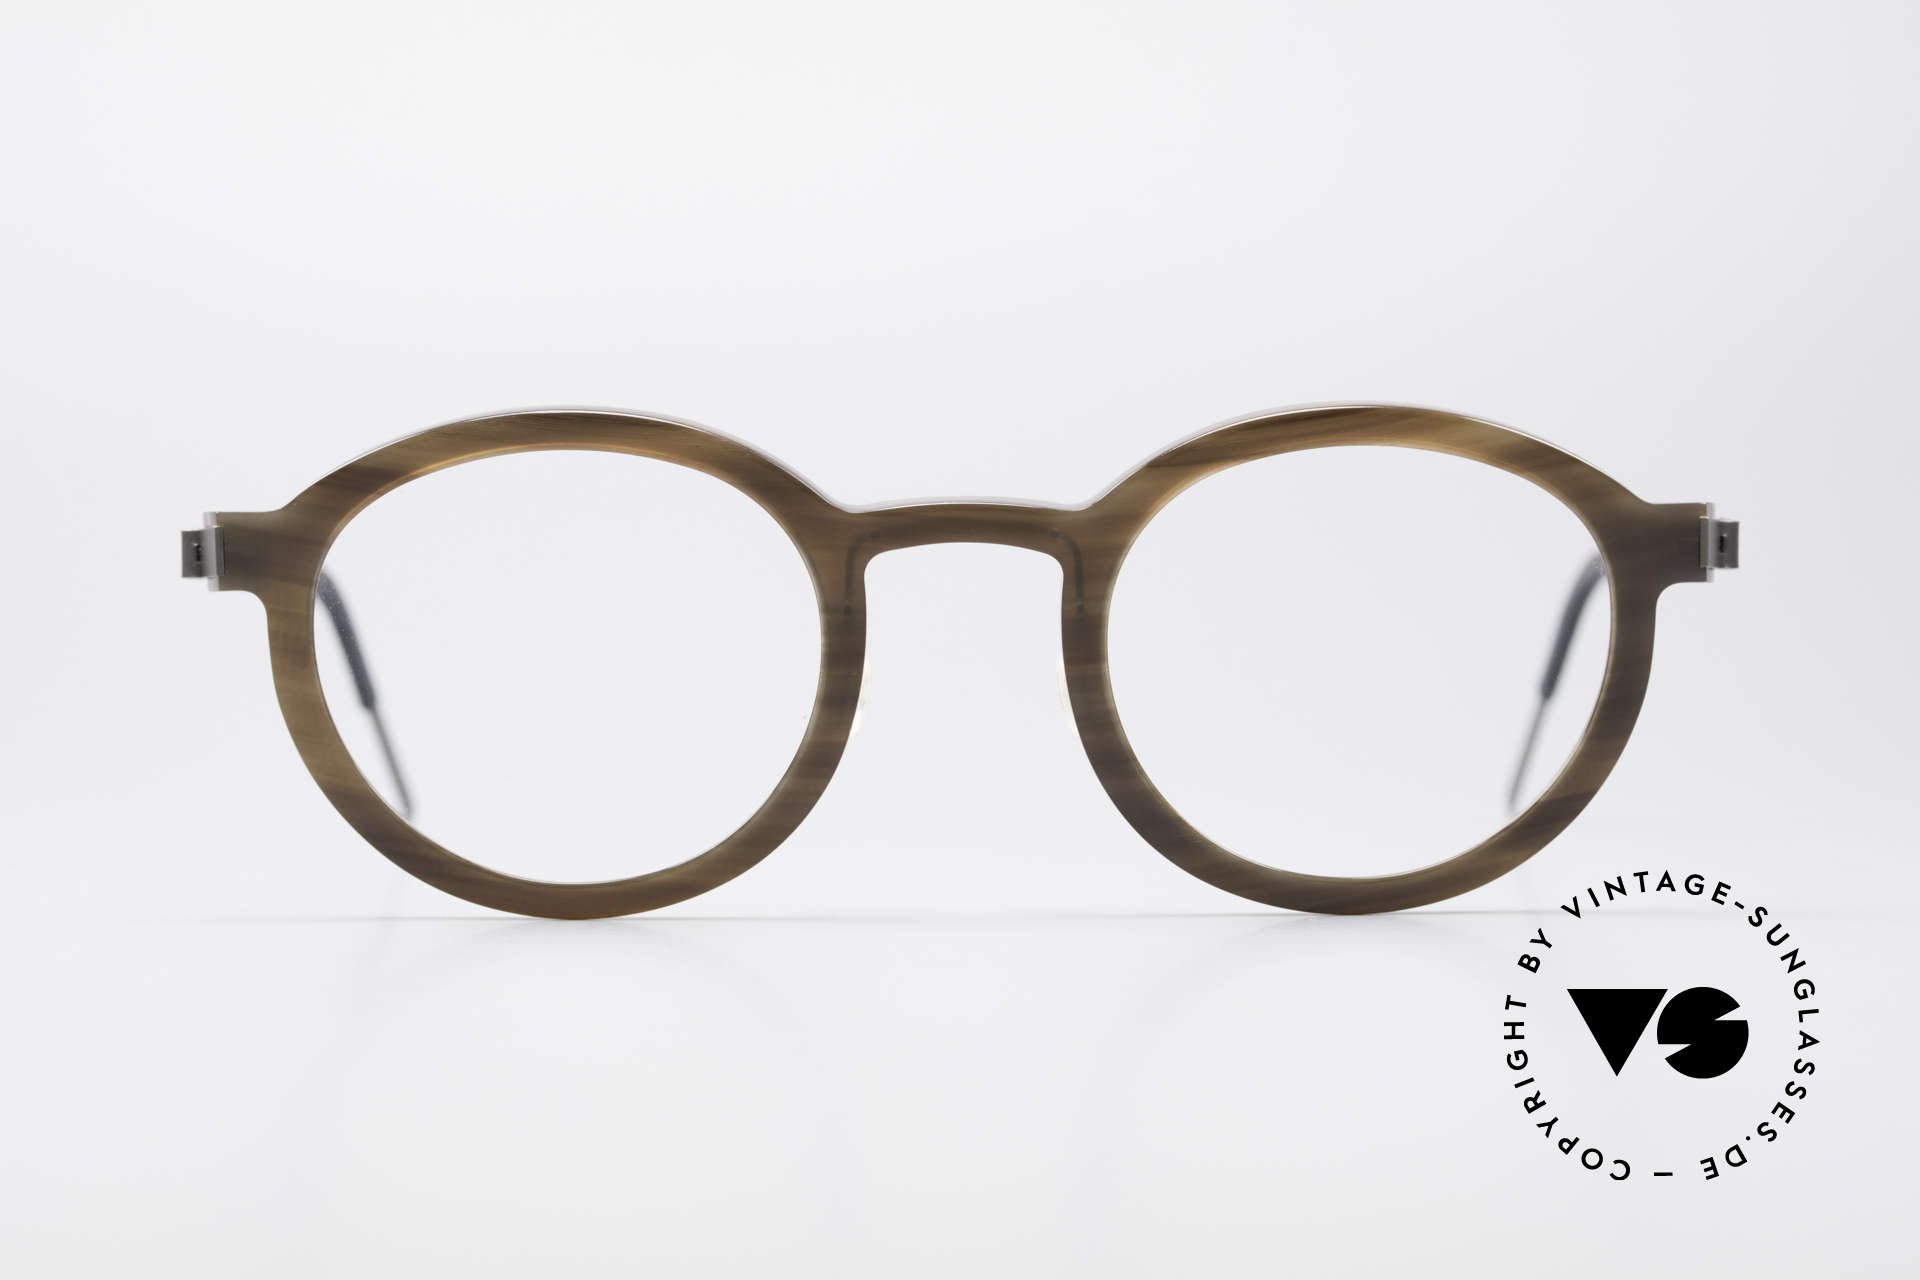 1afbb91997b Glasses lindberg horn titanium round frame vintage jpg 1920x1280 Lindberg  round silver frame